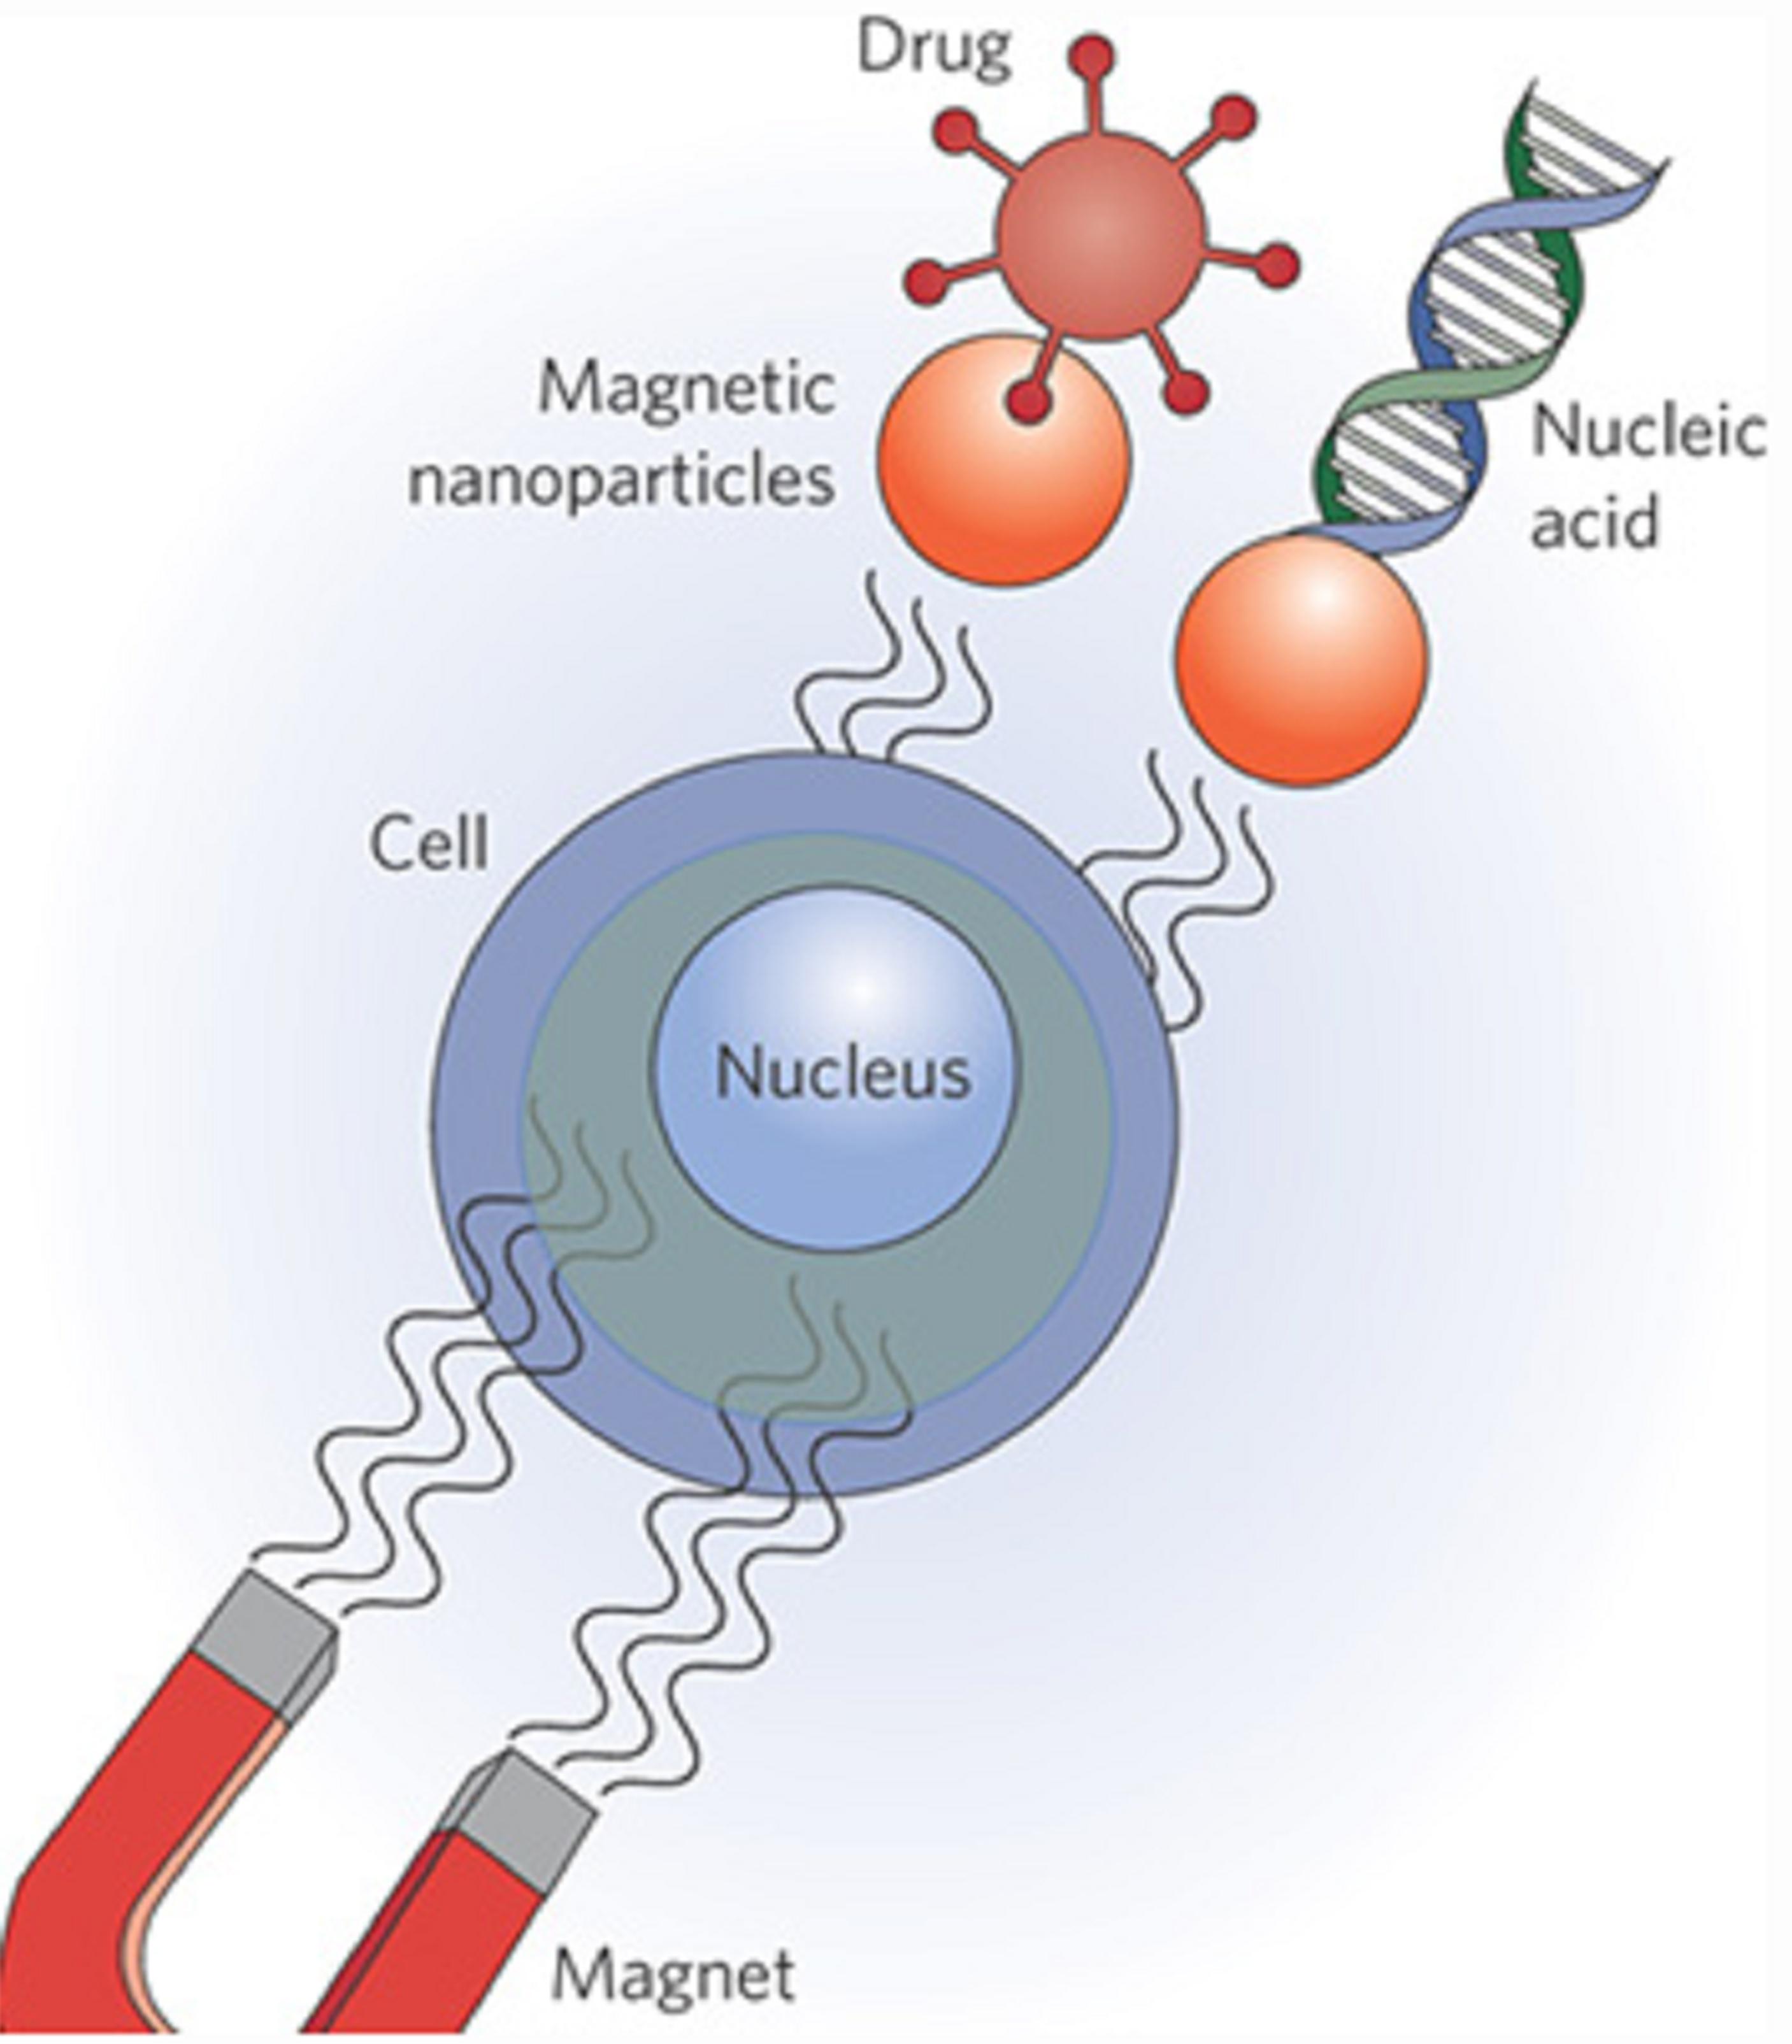 Magnetic Drug Targetting